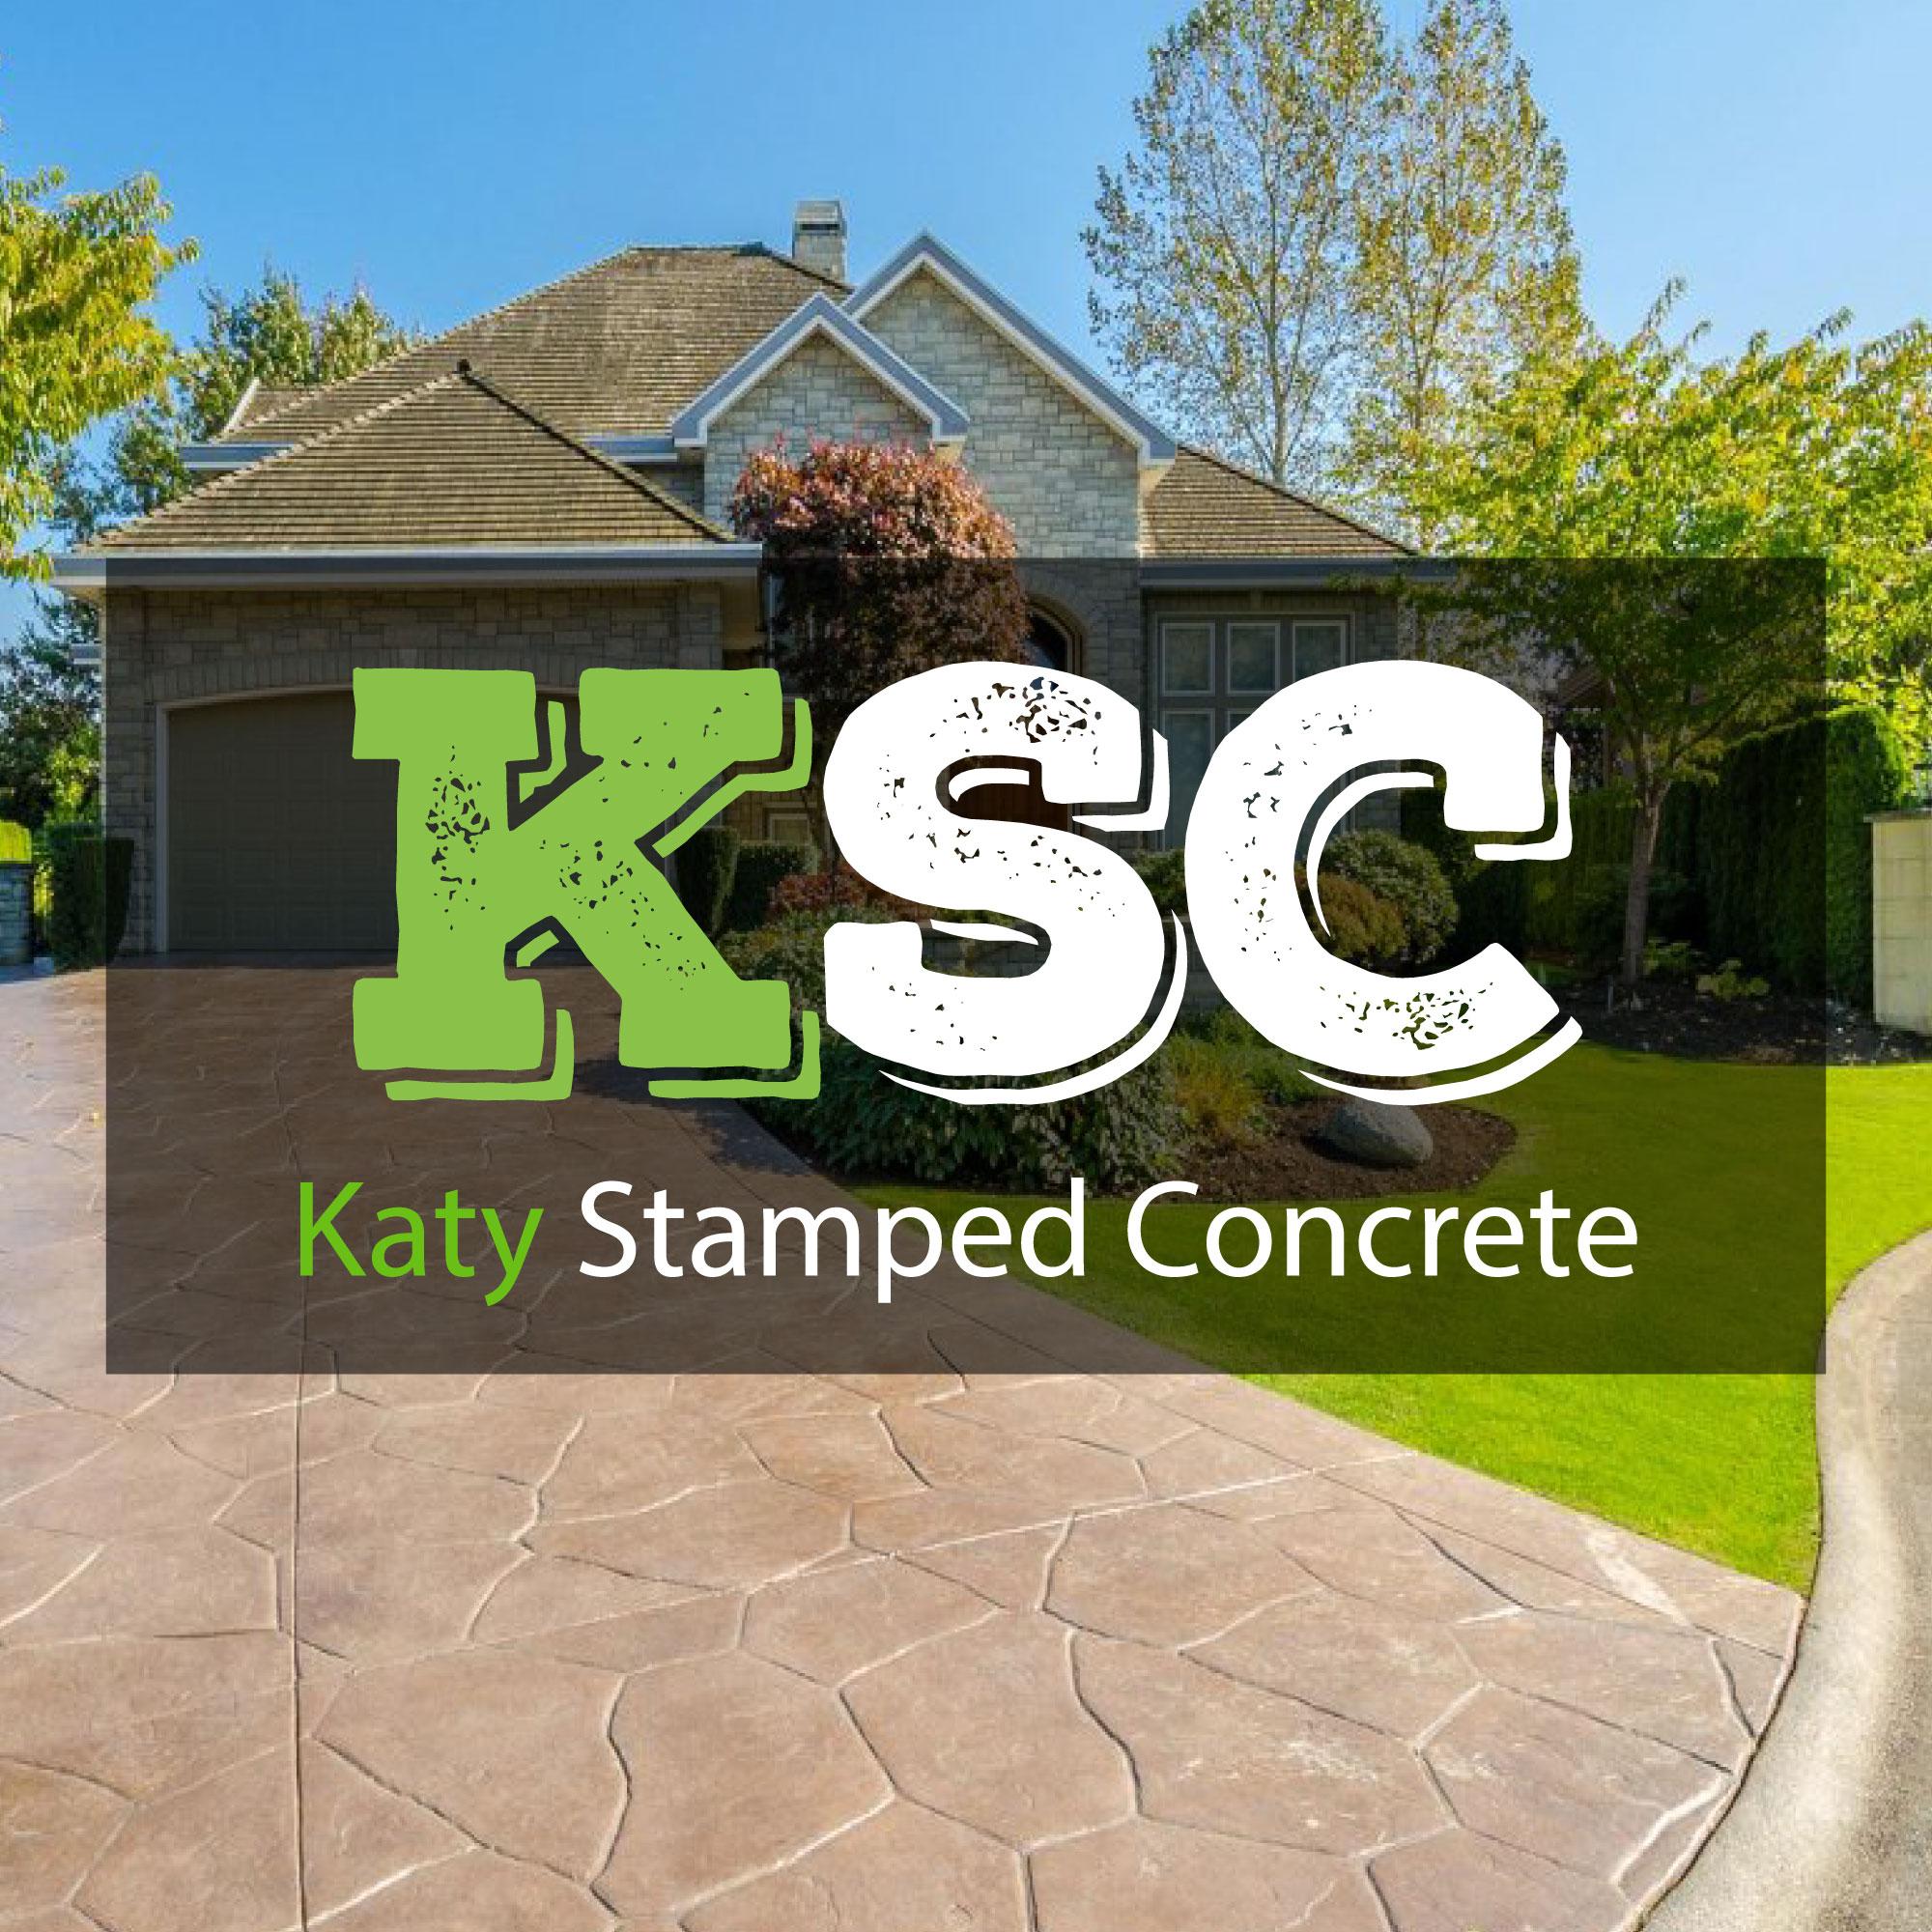 Katy-Stamped-Concrete-FB-Profile.jpg